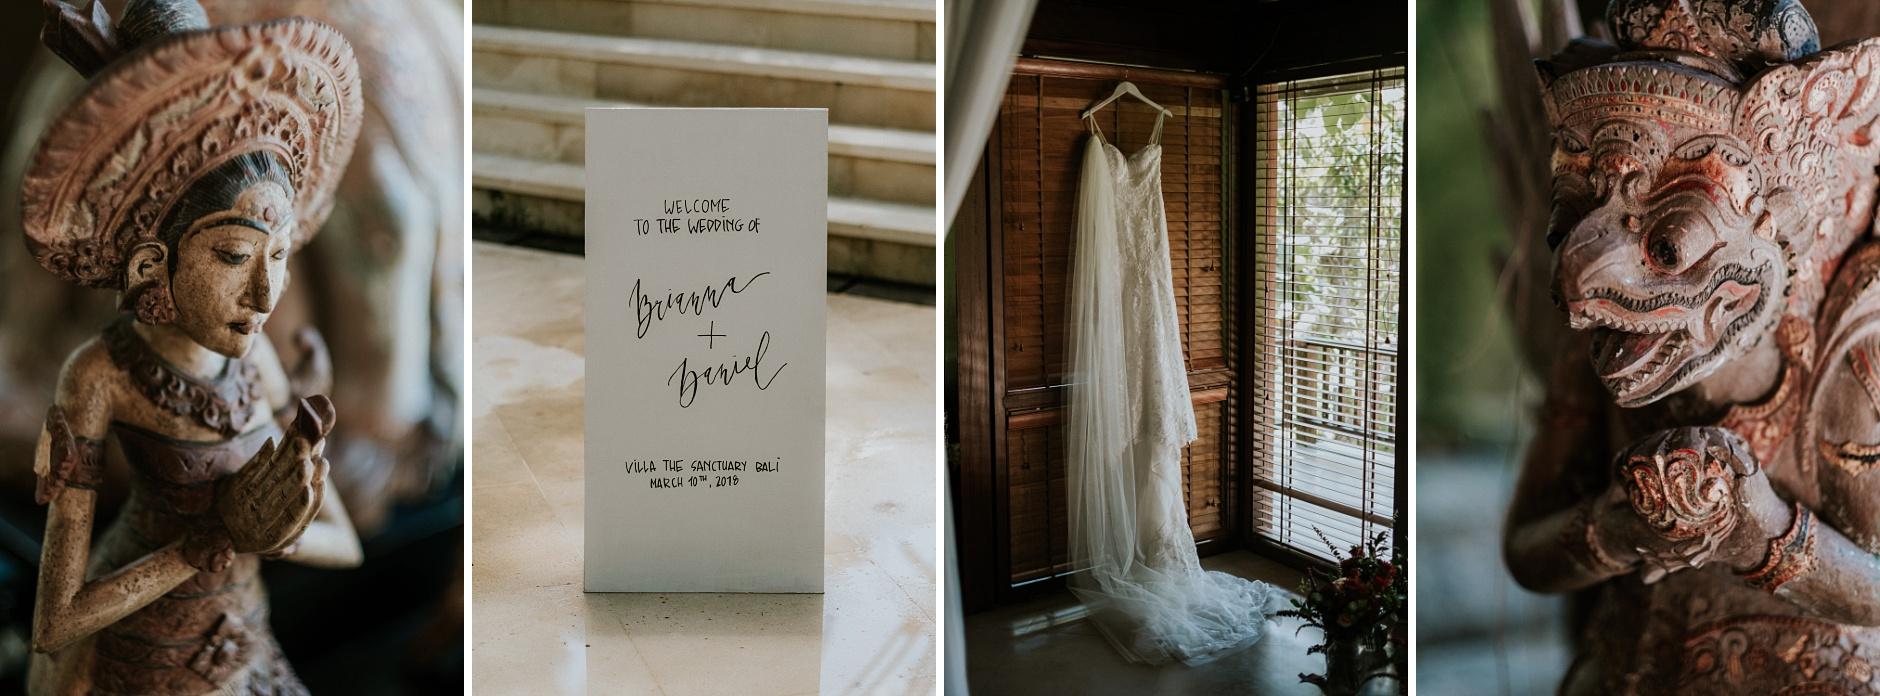 breanna&dan0092a_Bali-Wedding-Photographer-1.jpg